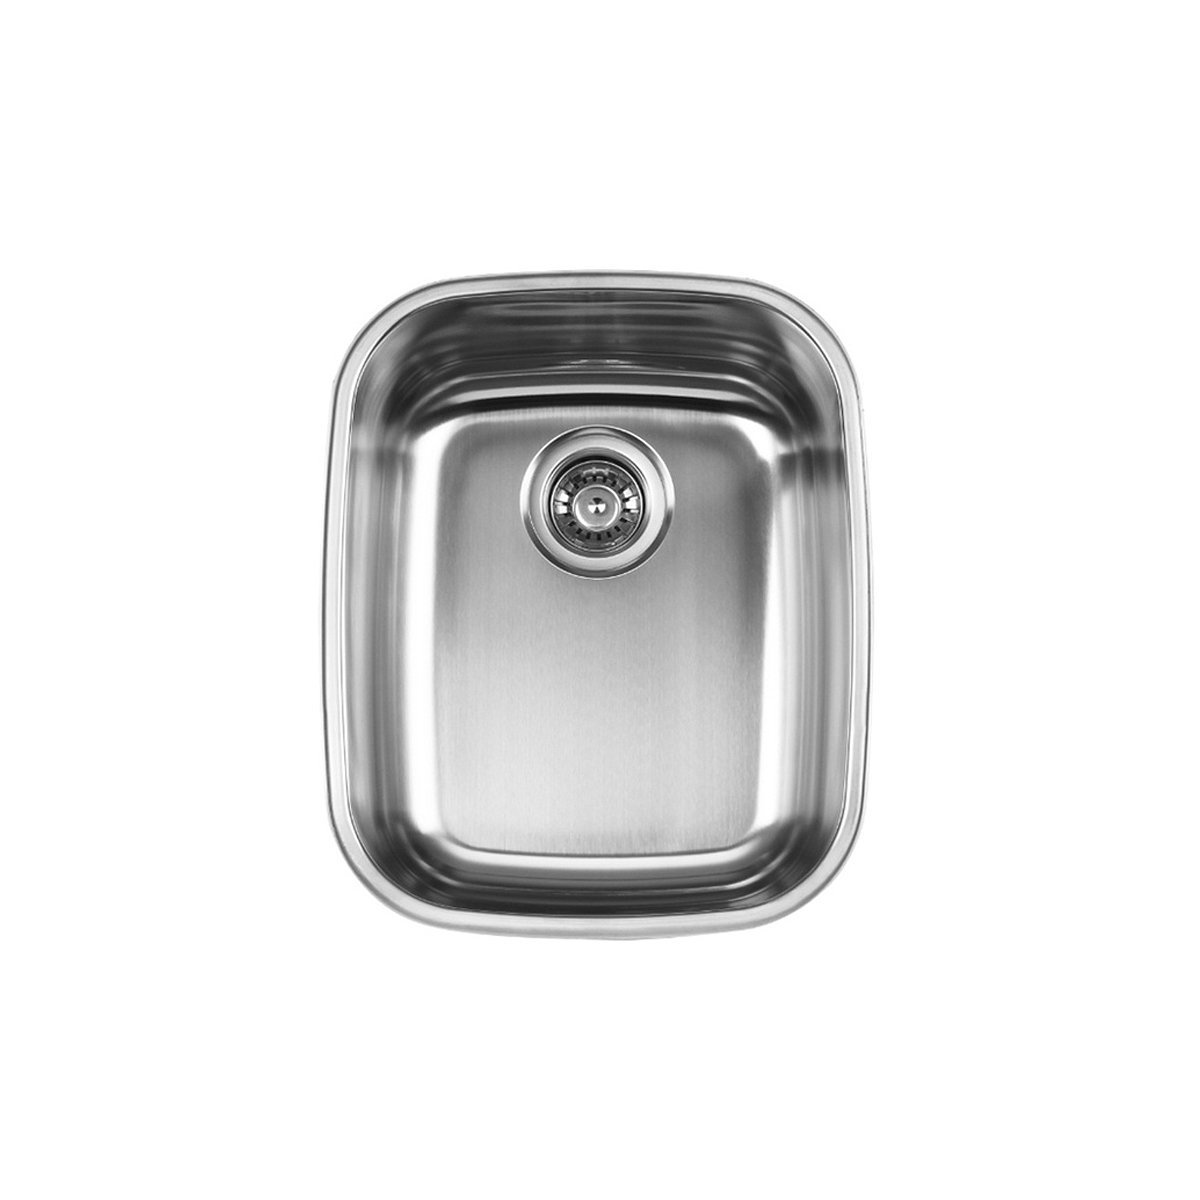 Amazon.com: Ukinox GR537SS Modern Stainless Steel Bottom Grid: Home  Improvement